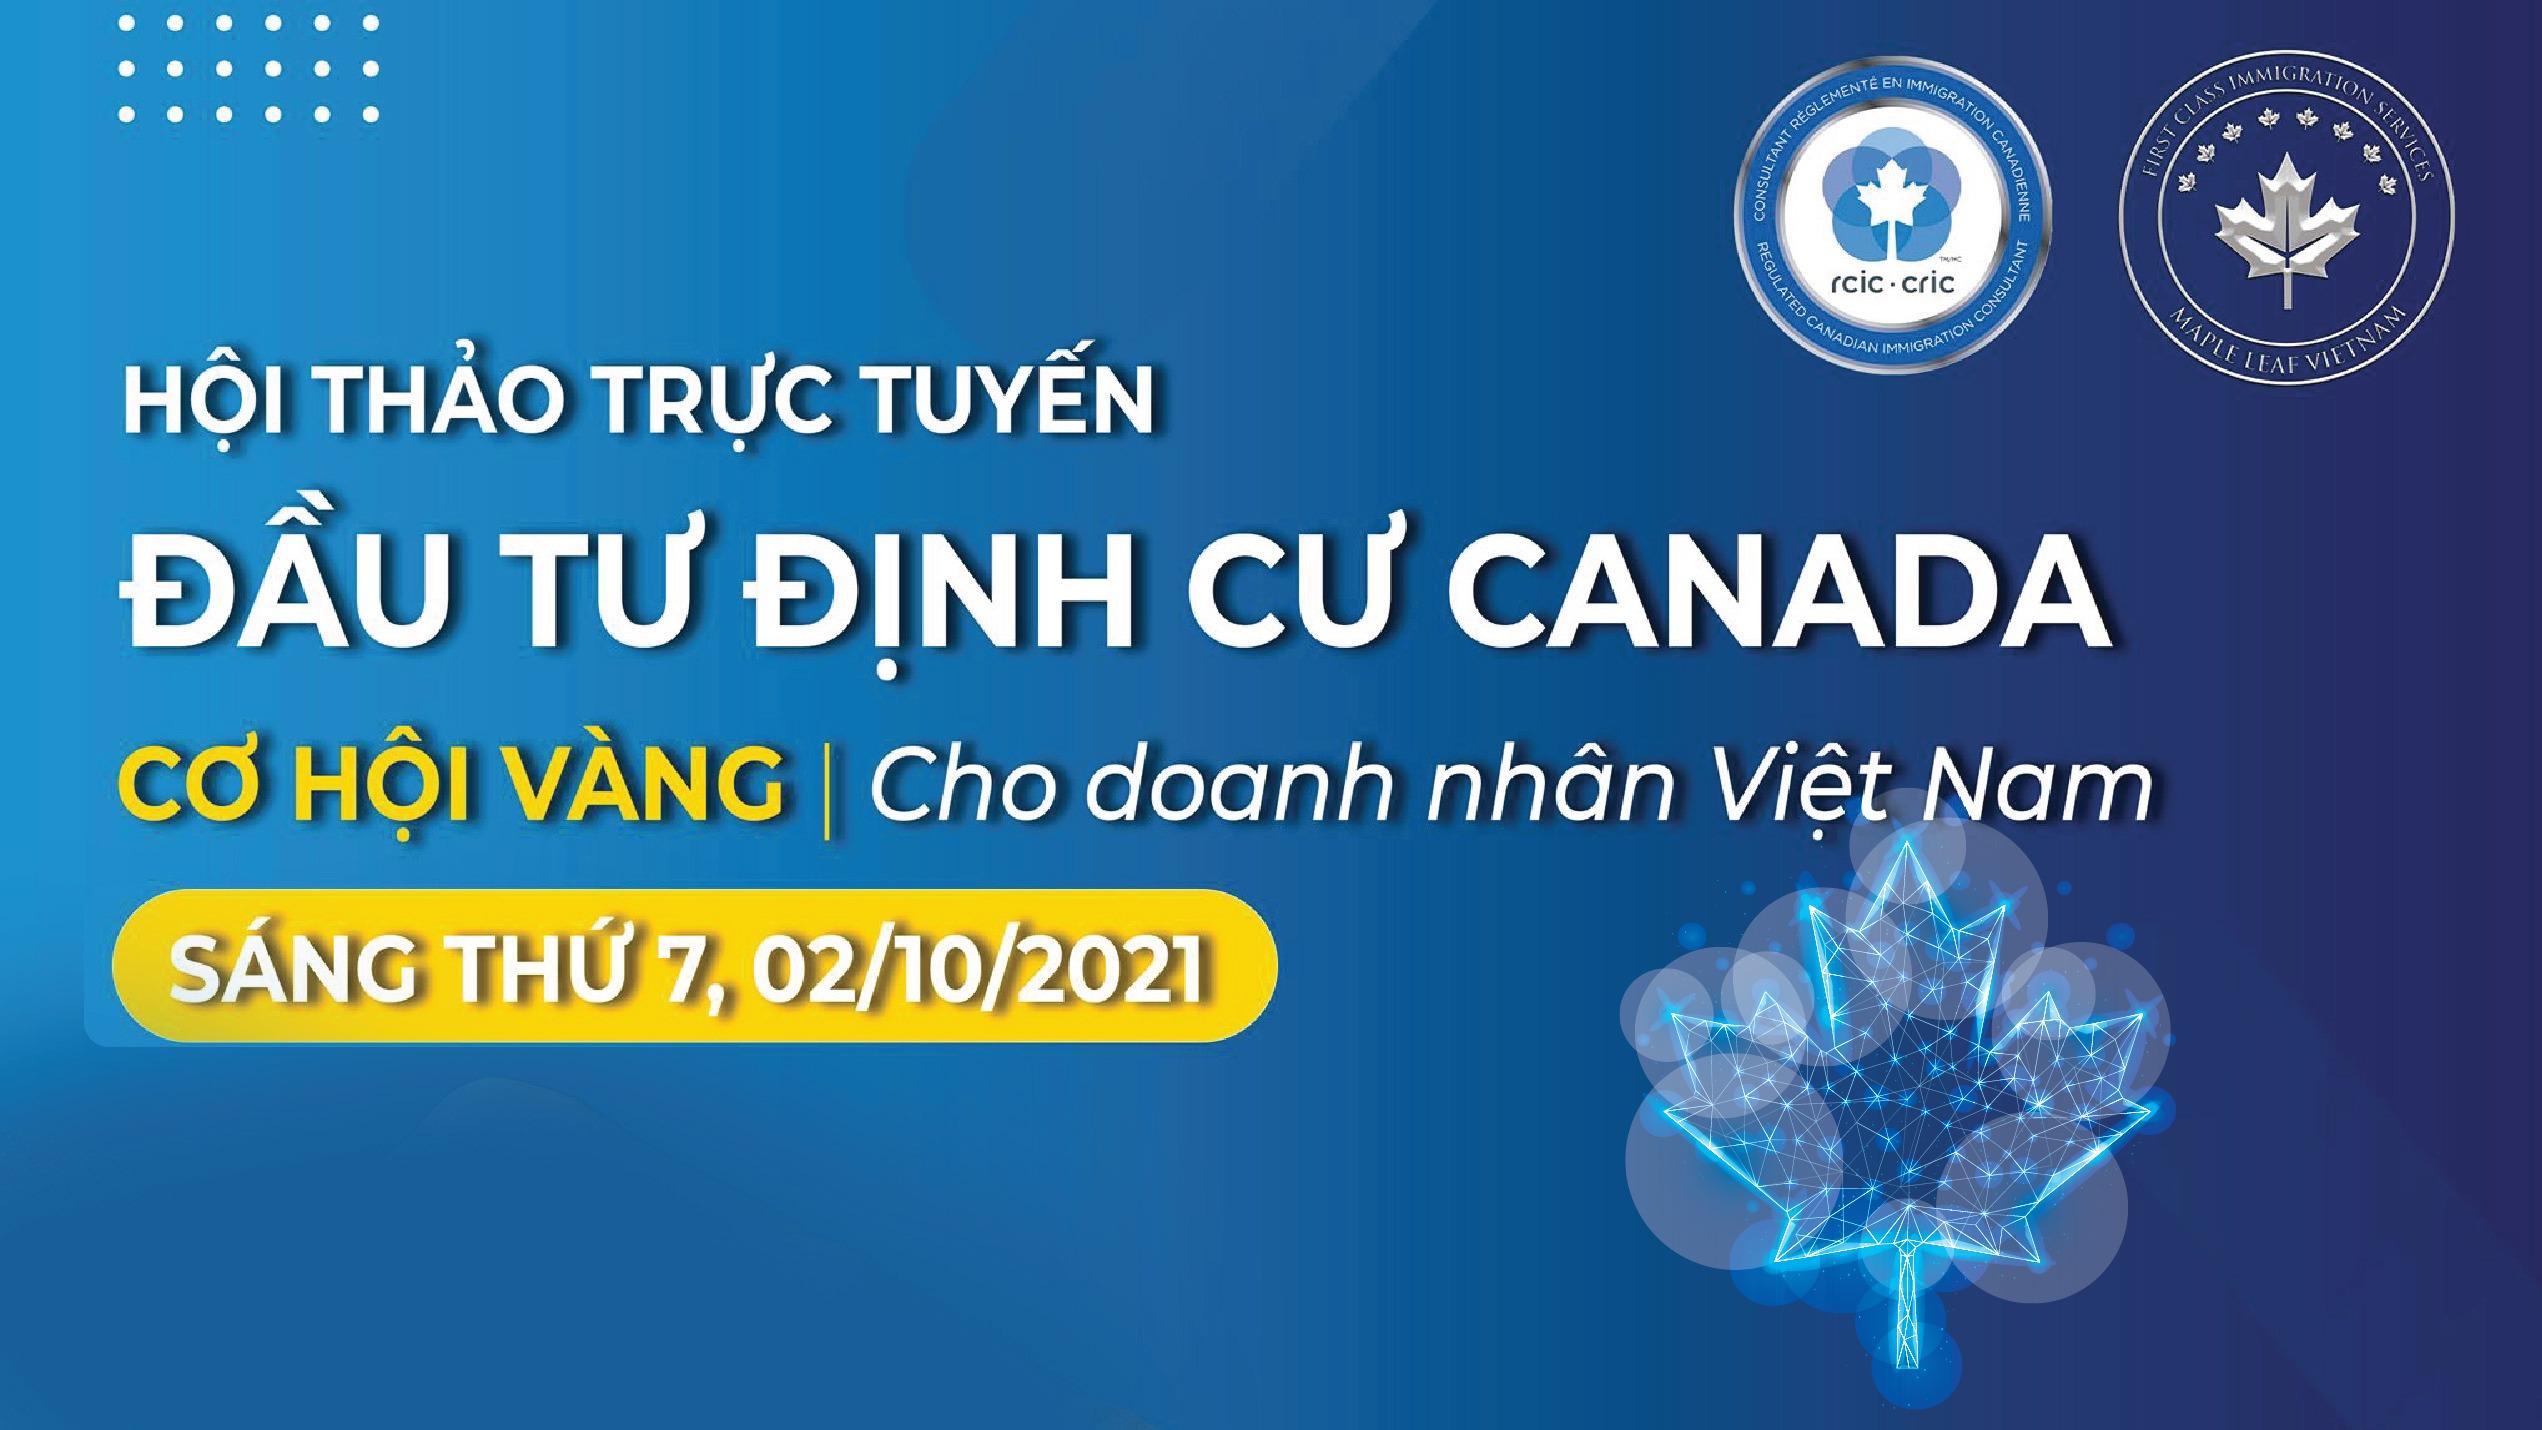 dau-tu-dinh-cu-canada-co-hoi-vang-cho-doanh-nhan-viet